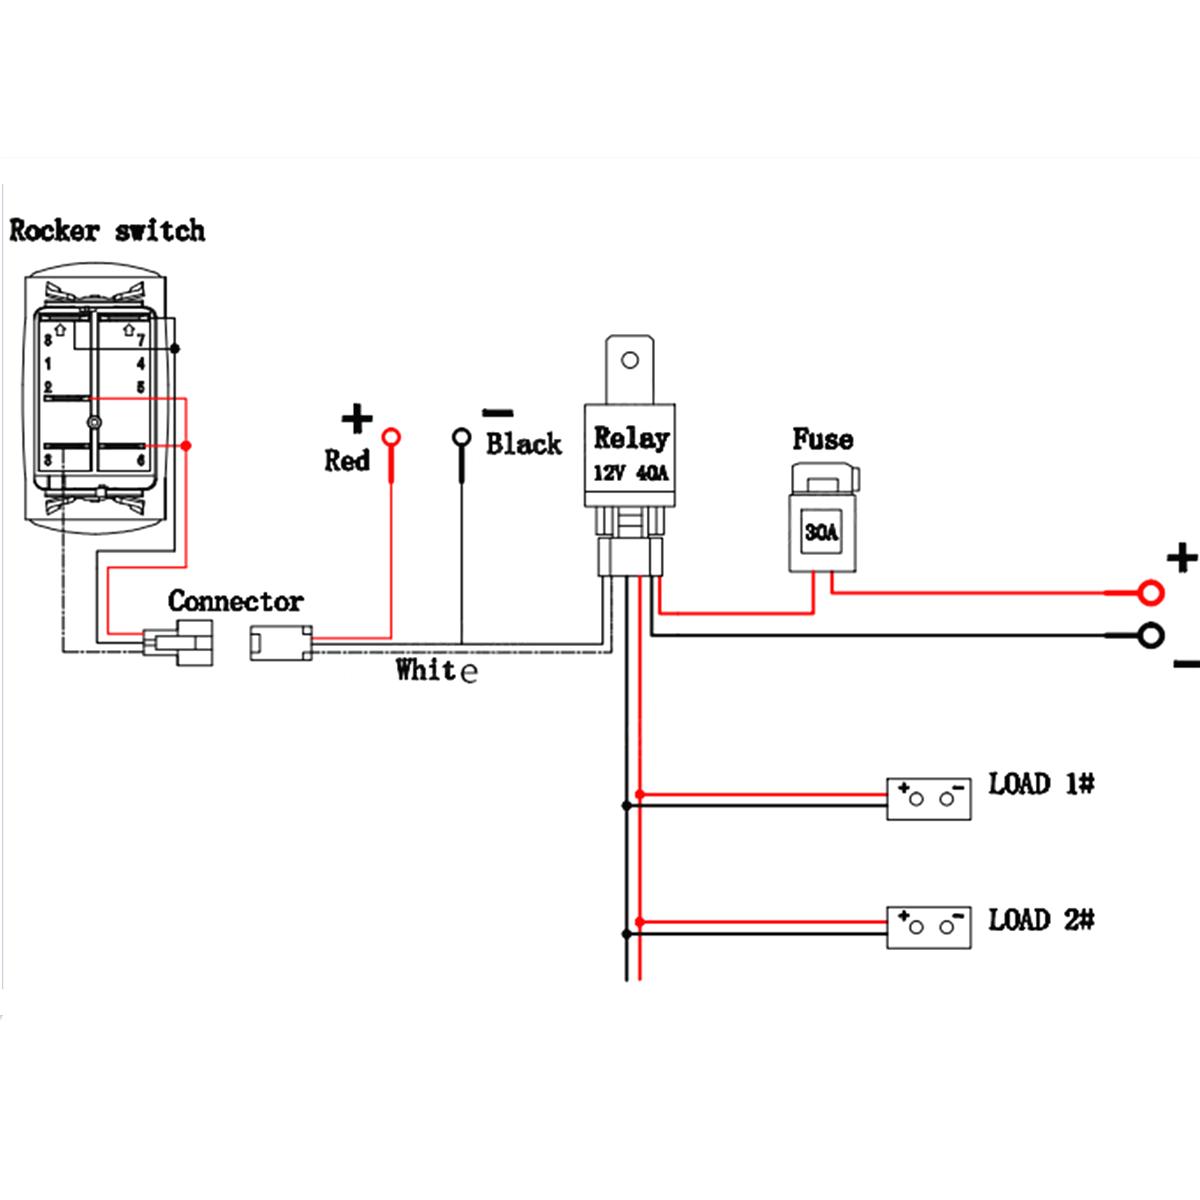 medium resolution of 12v 40a led fog light wiring harness laser rocker switch relay picturesque led diagram